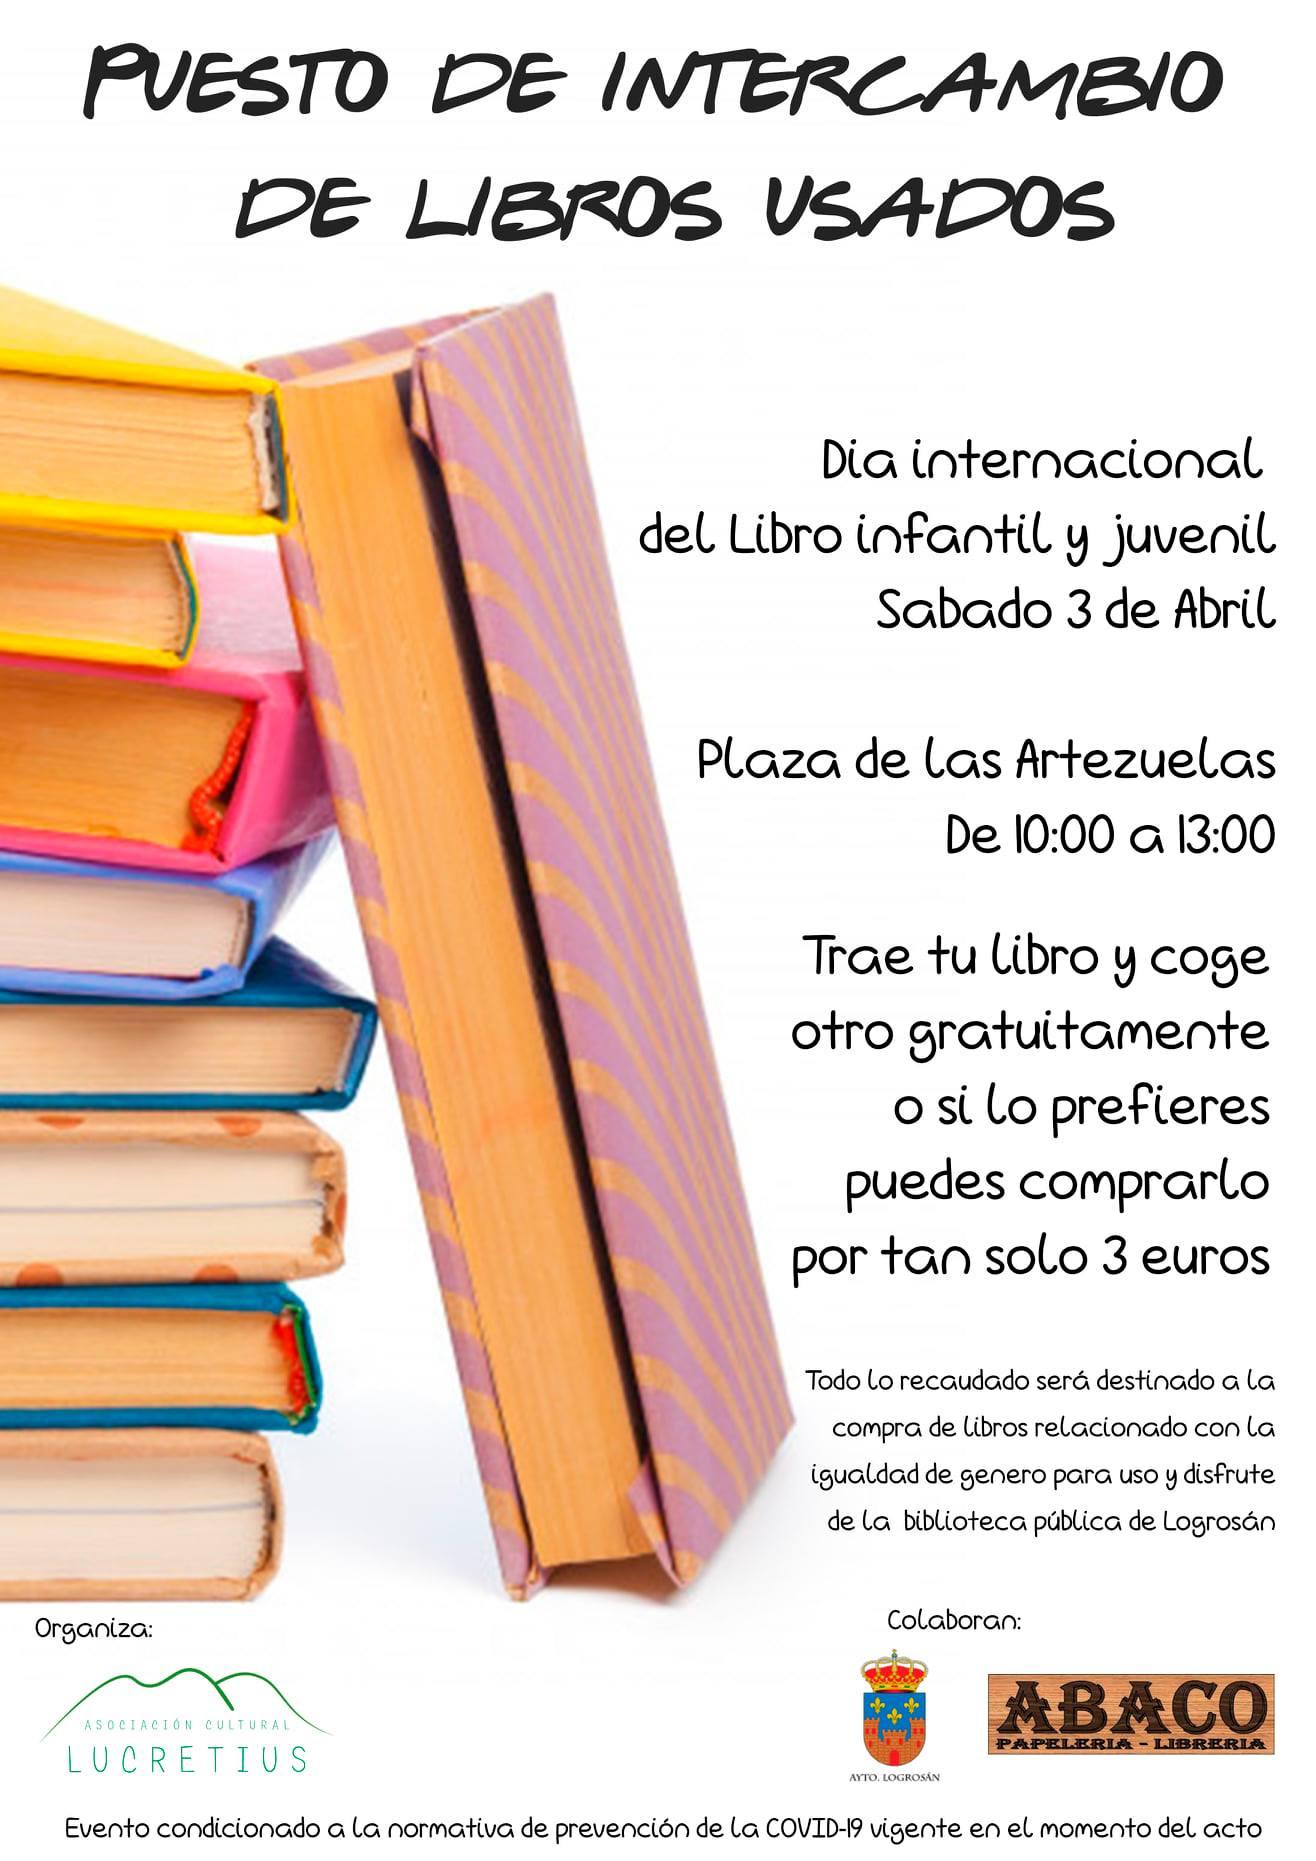 Puesto de intercambio de libros usados (2021) - Logrosán (Cáceres)